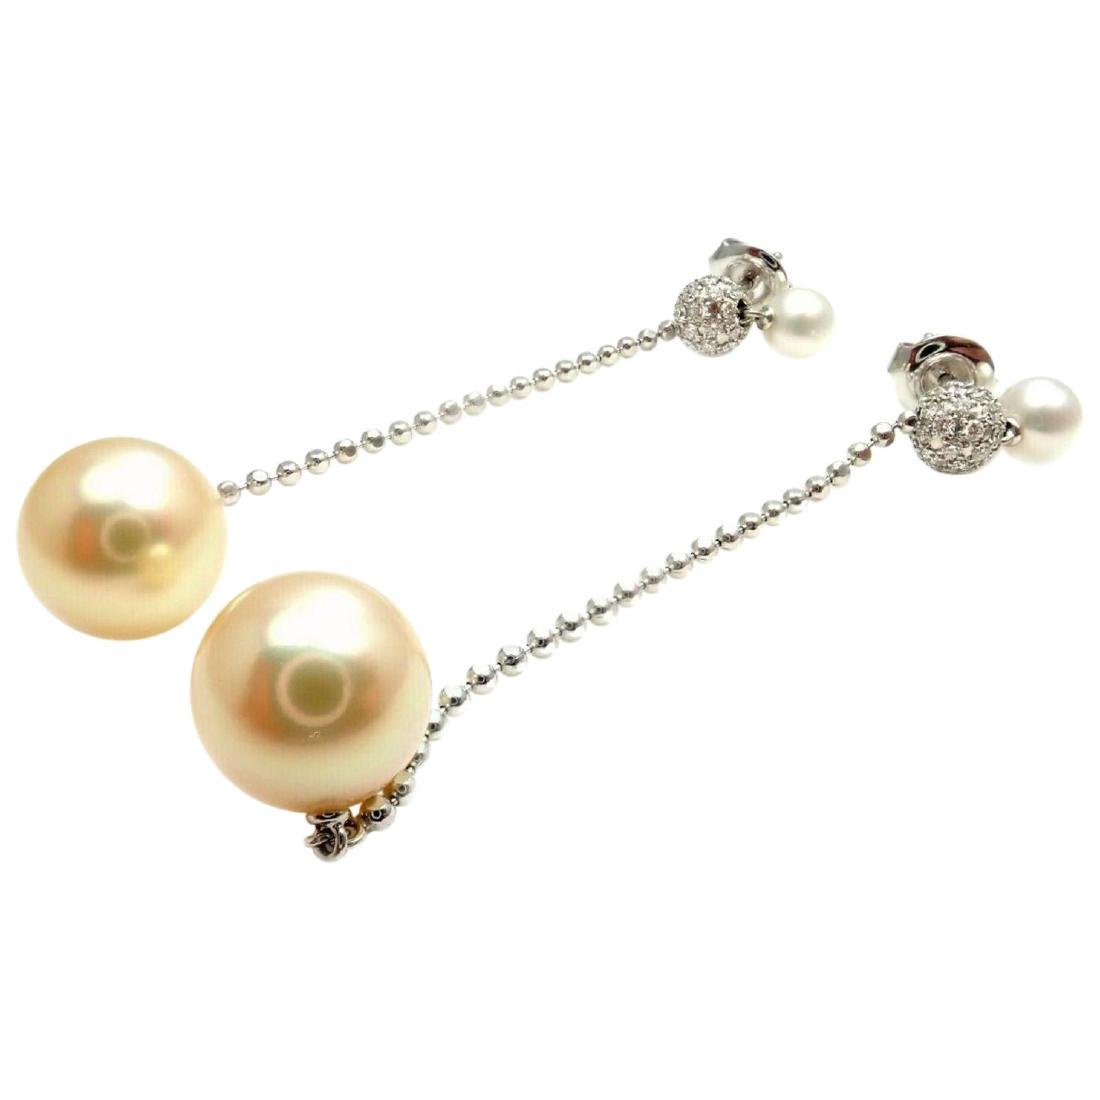 27a97f6e0e9b8 Mikimoto Golden South Sea Pearl Diamond White Gold - Mar 30, 2019 ...